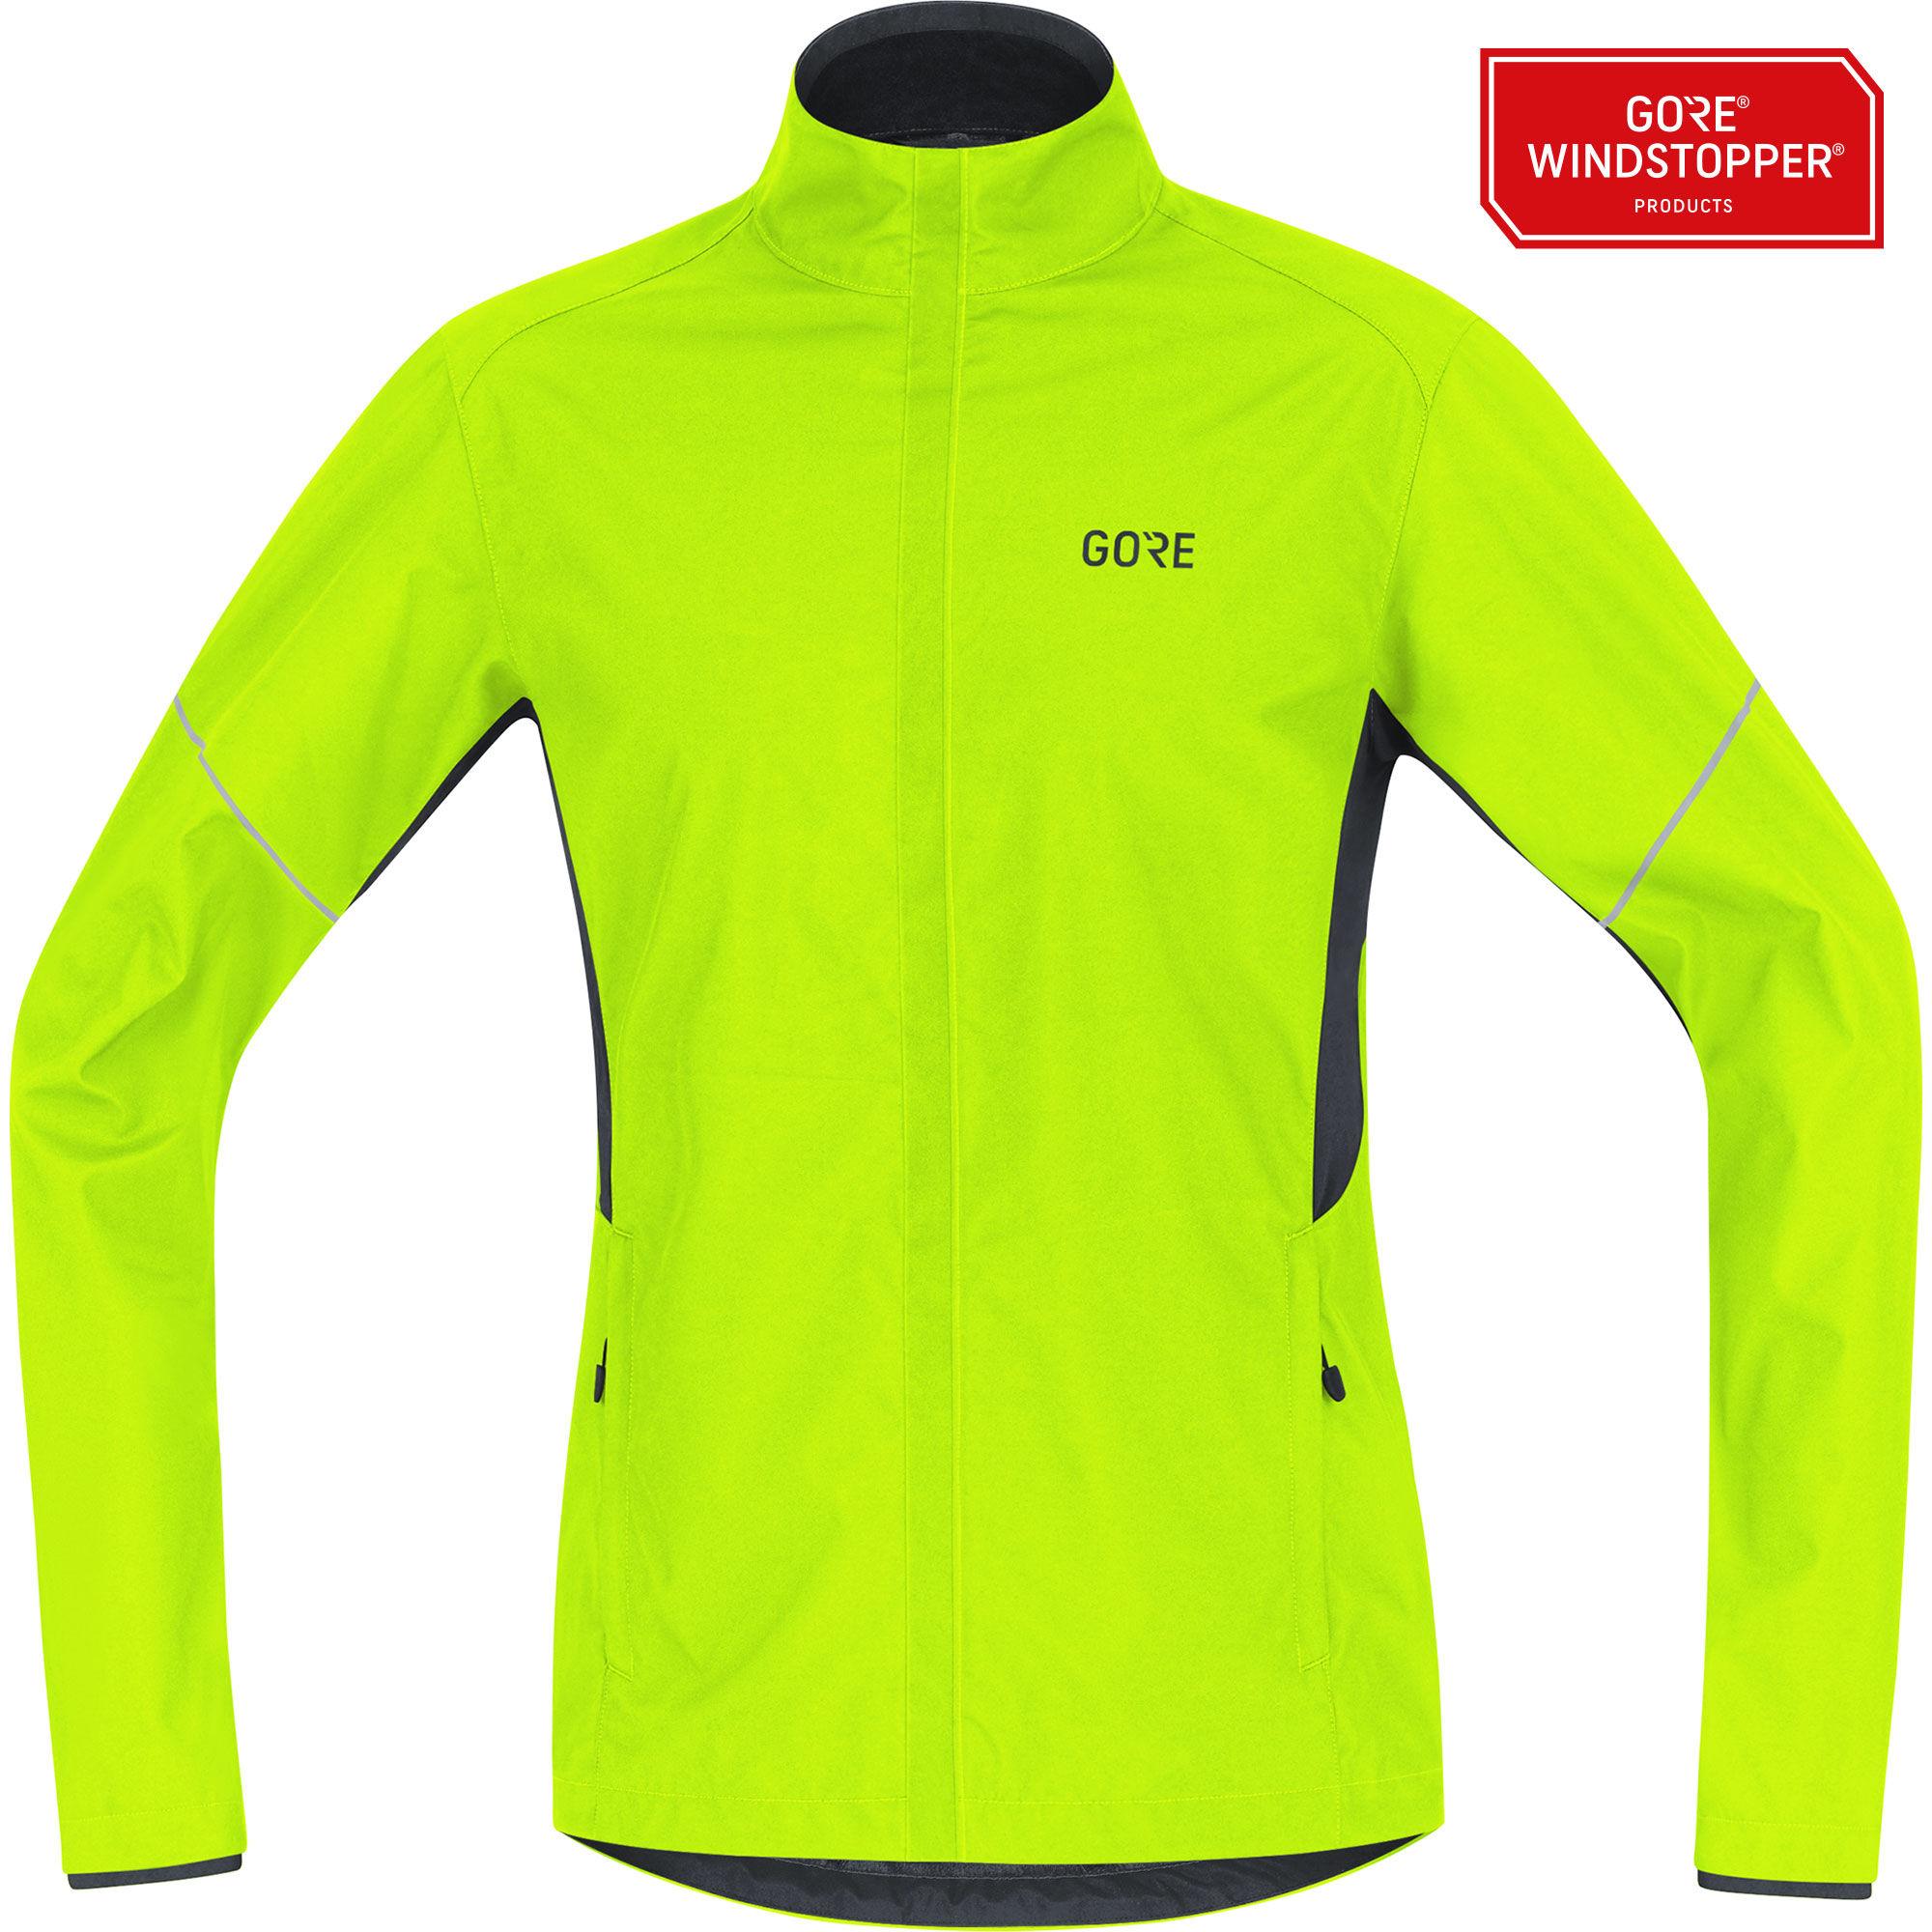 Gore R3 Partial GWS Jacke (Neon Gelb)